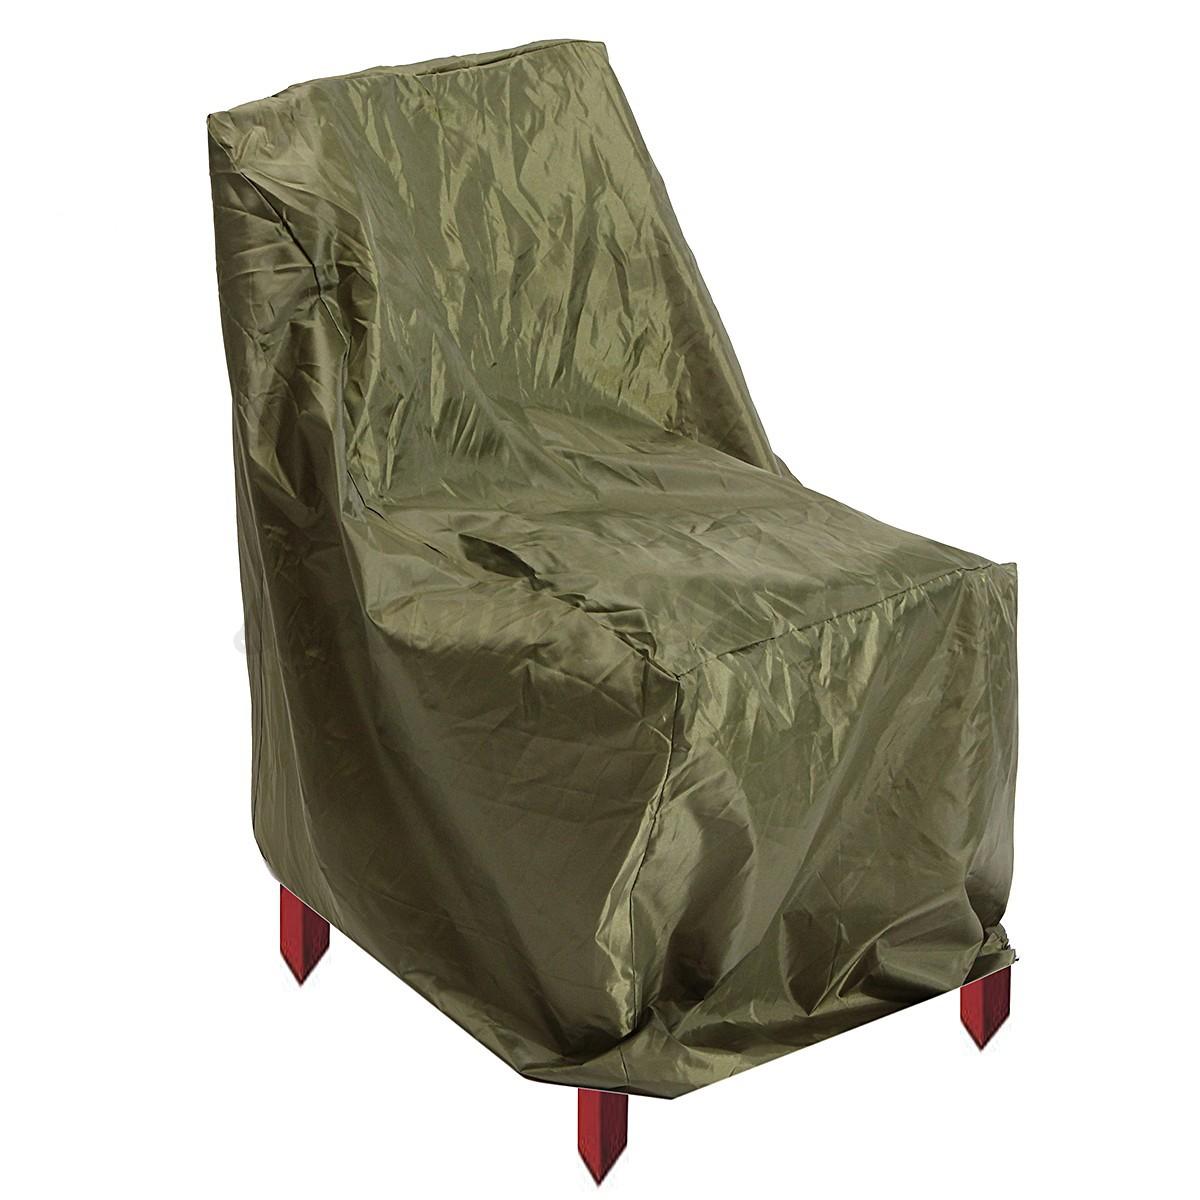 Outdoor Waterproof High Back Chair Cover Garden Patio